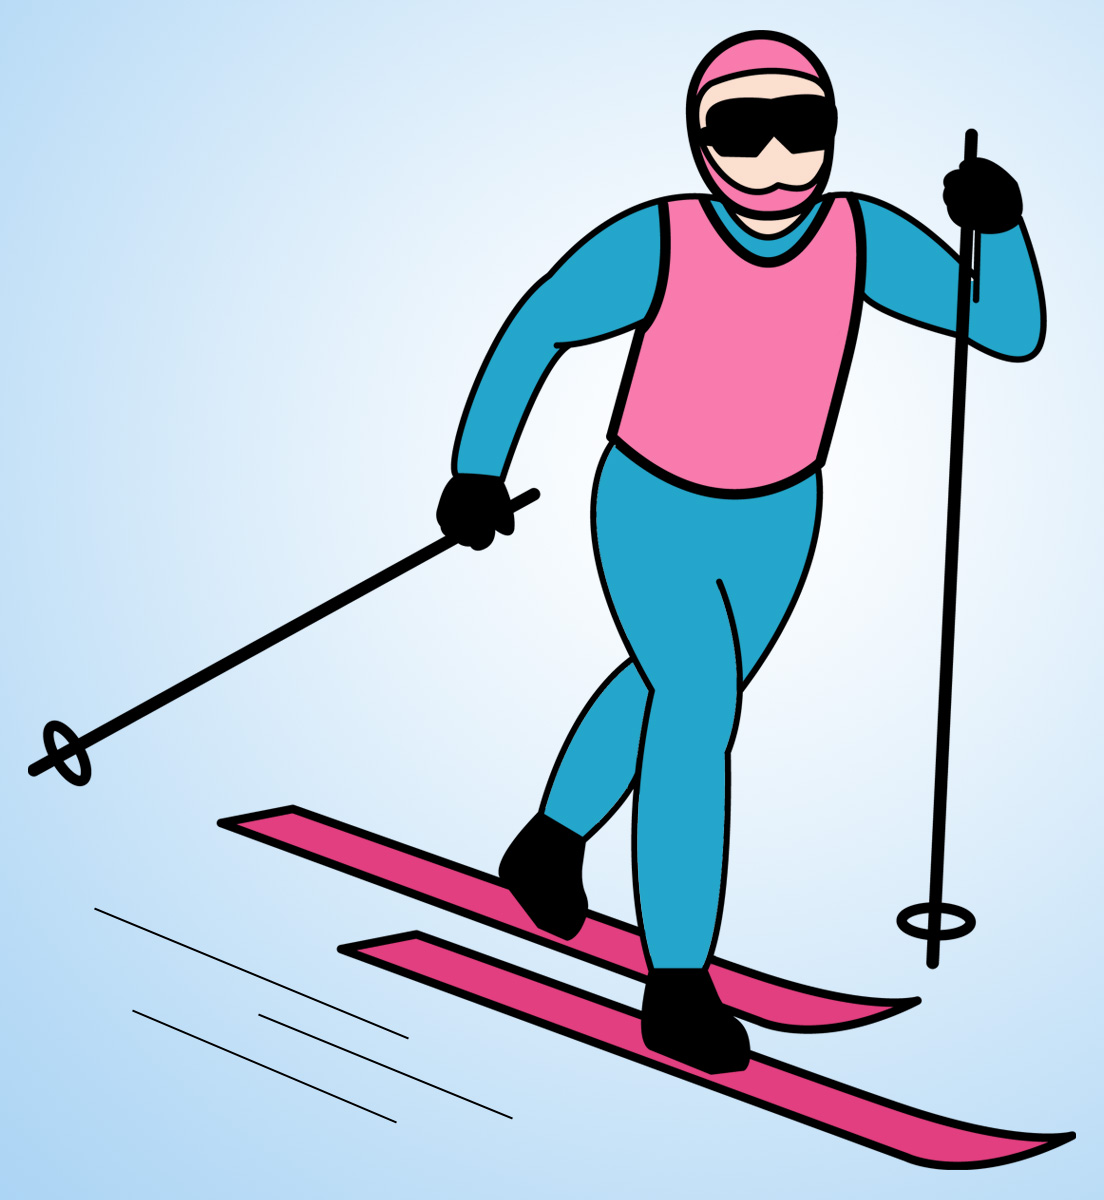 Skiing Clip Art - ClipArt Best